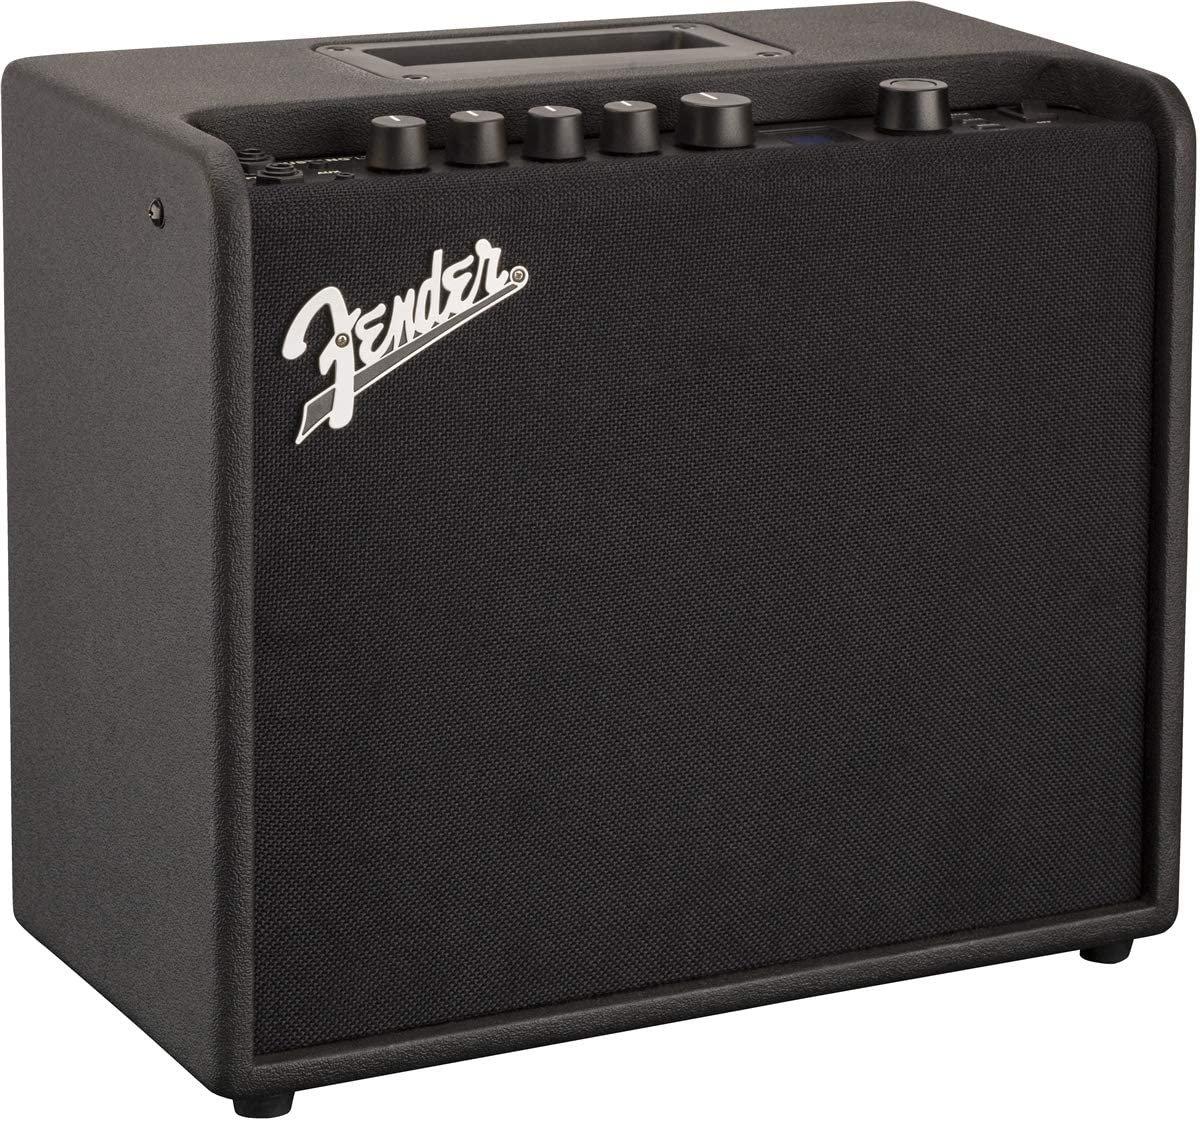 Fender Mustang LT 25 1x8 25-watt Combo Amp